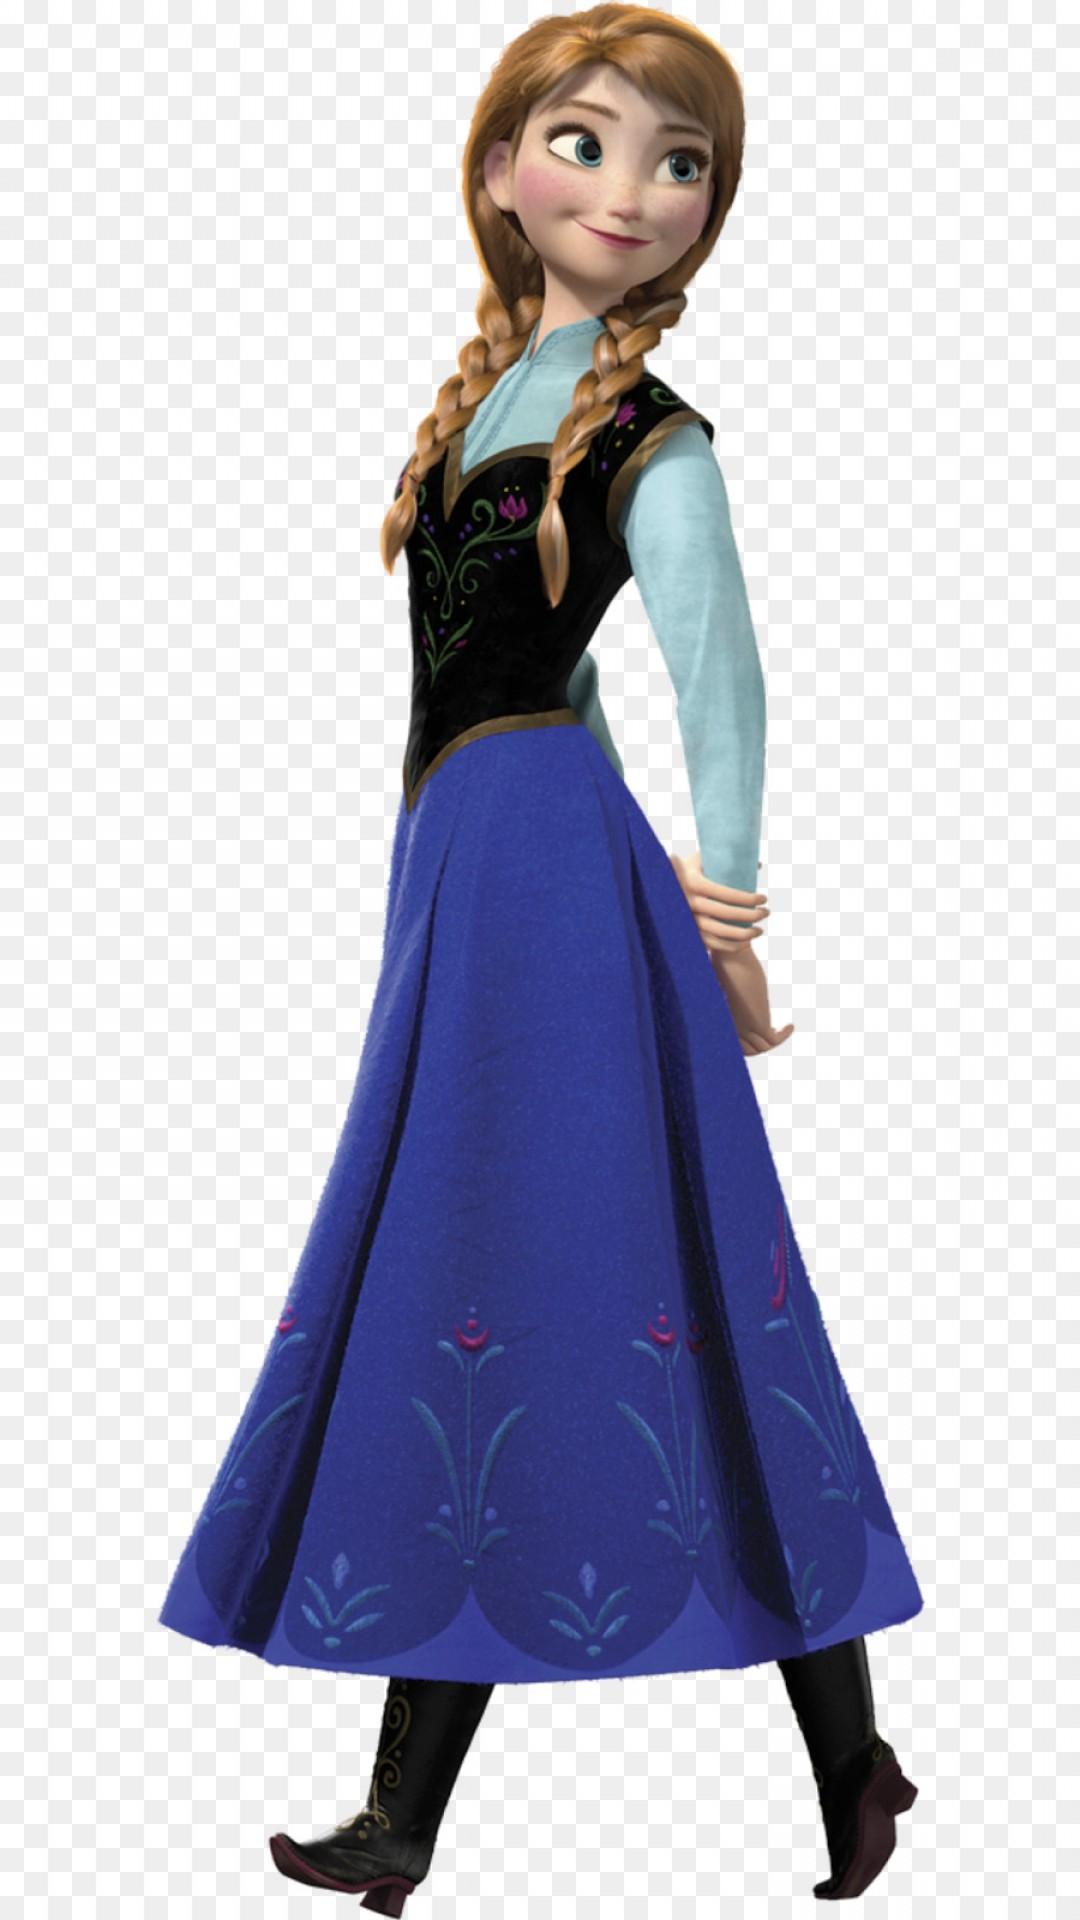 Png Frozen Anna Elsa Kristoff Olaf Creative.